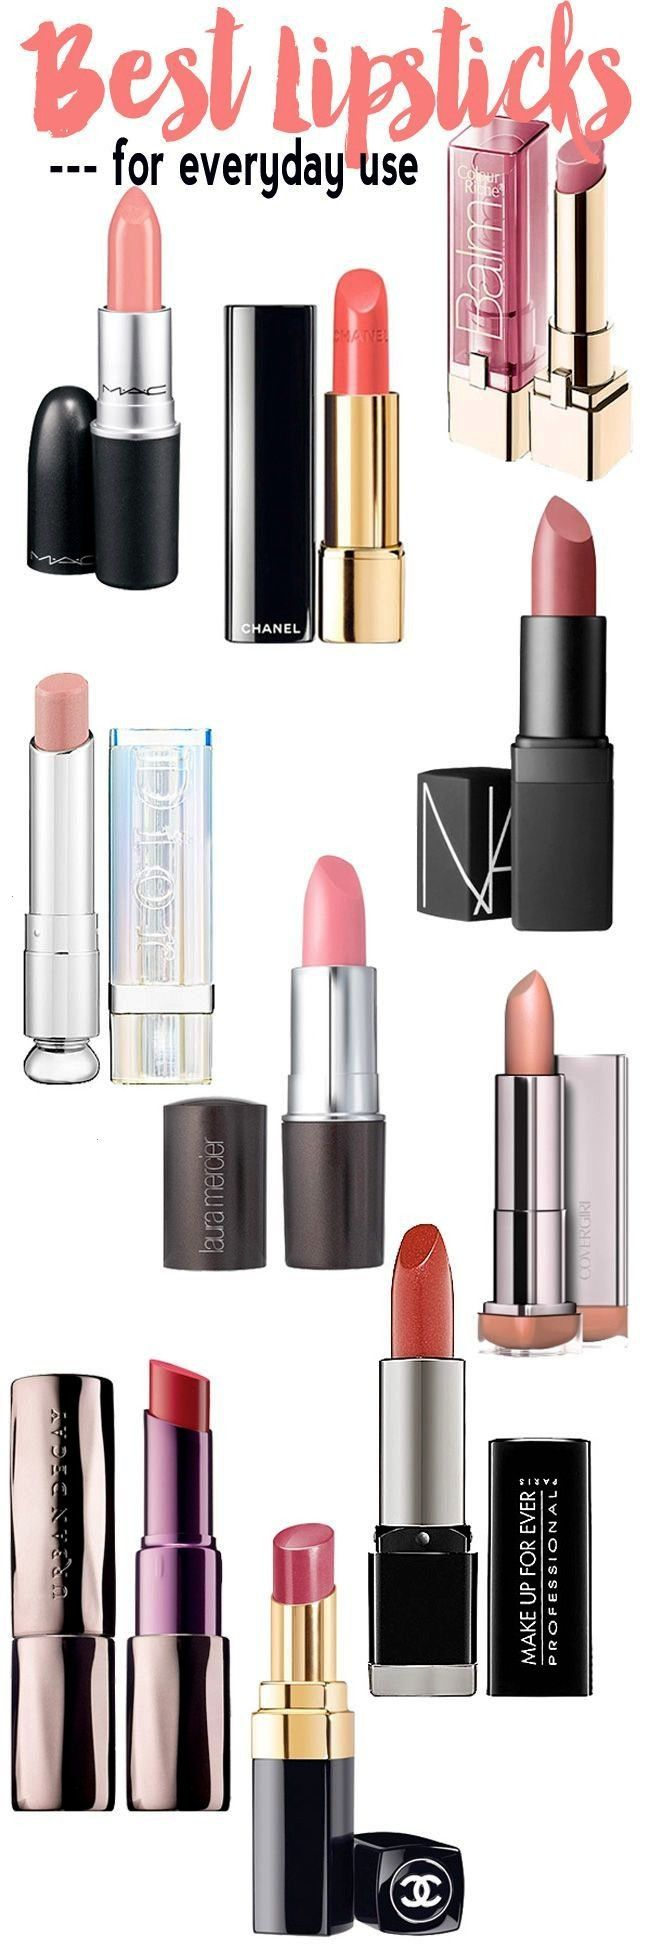 Lipstick Day: My FavoriteLipsticks. - Home - Beauty Blog, Makeup Reviews, Beauty Tips | Be Makeup